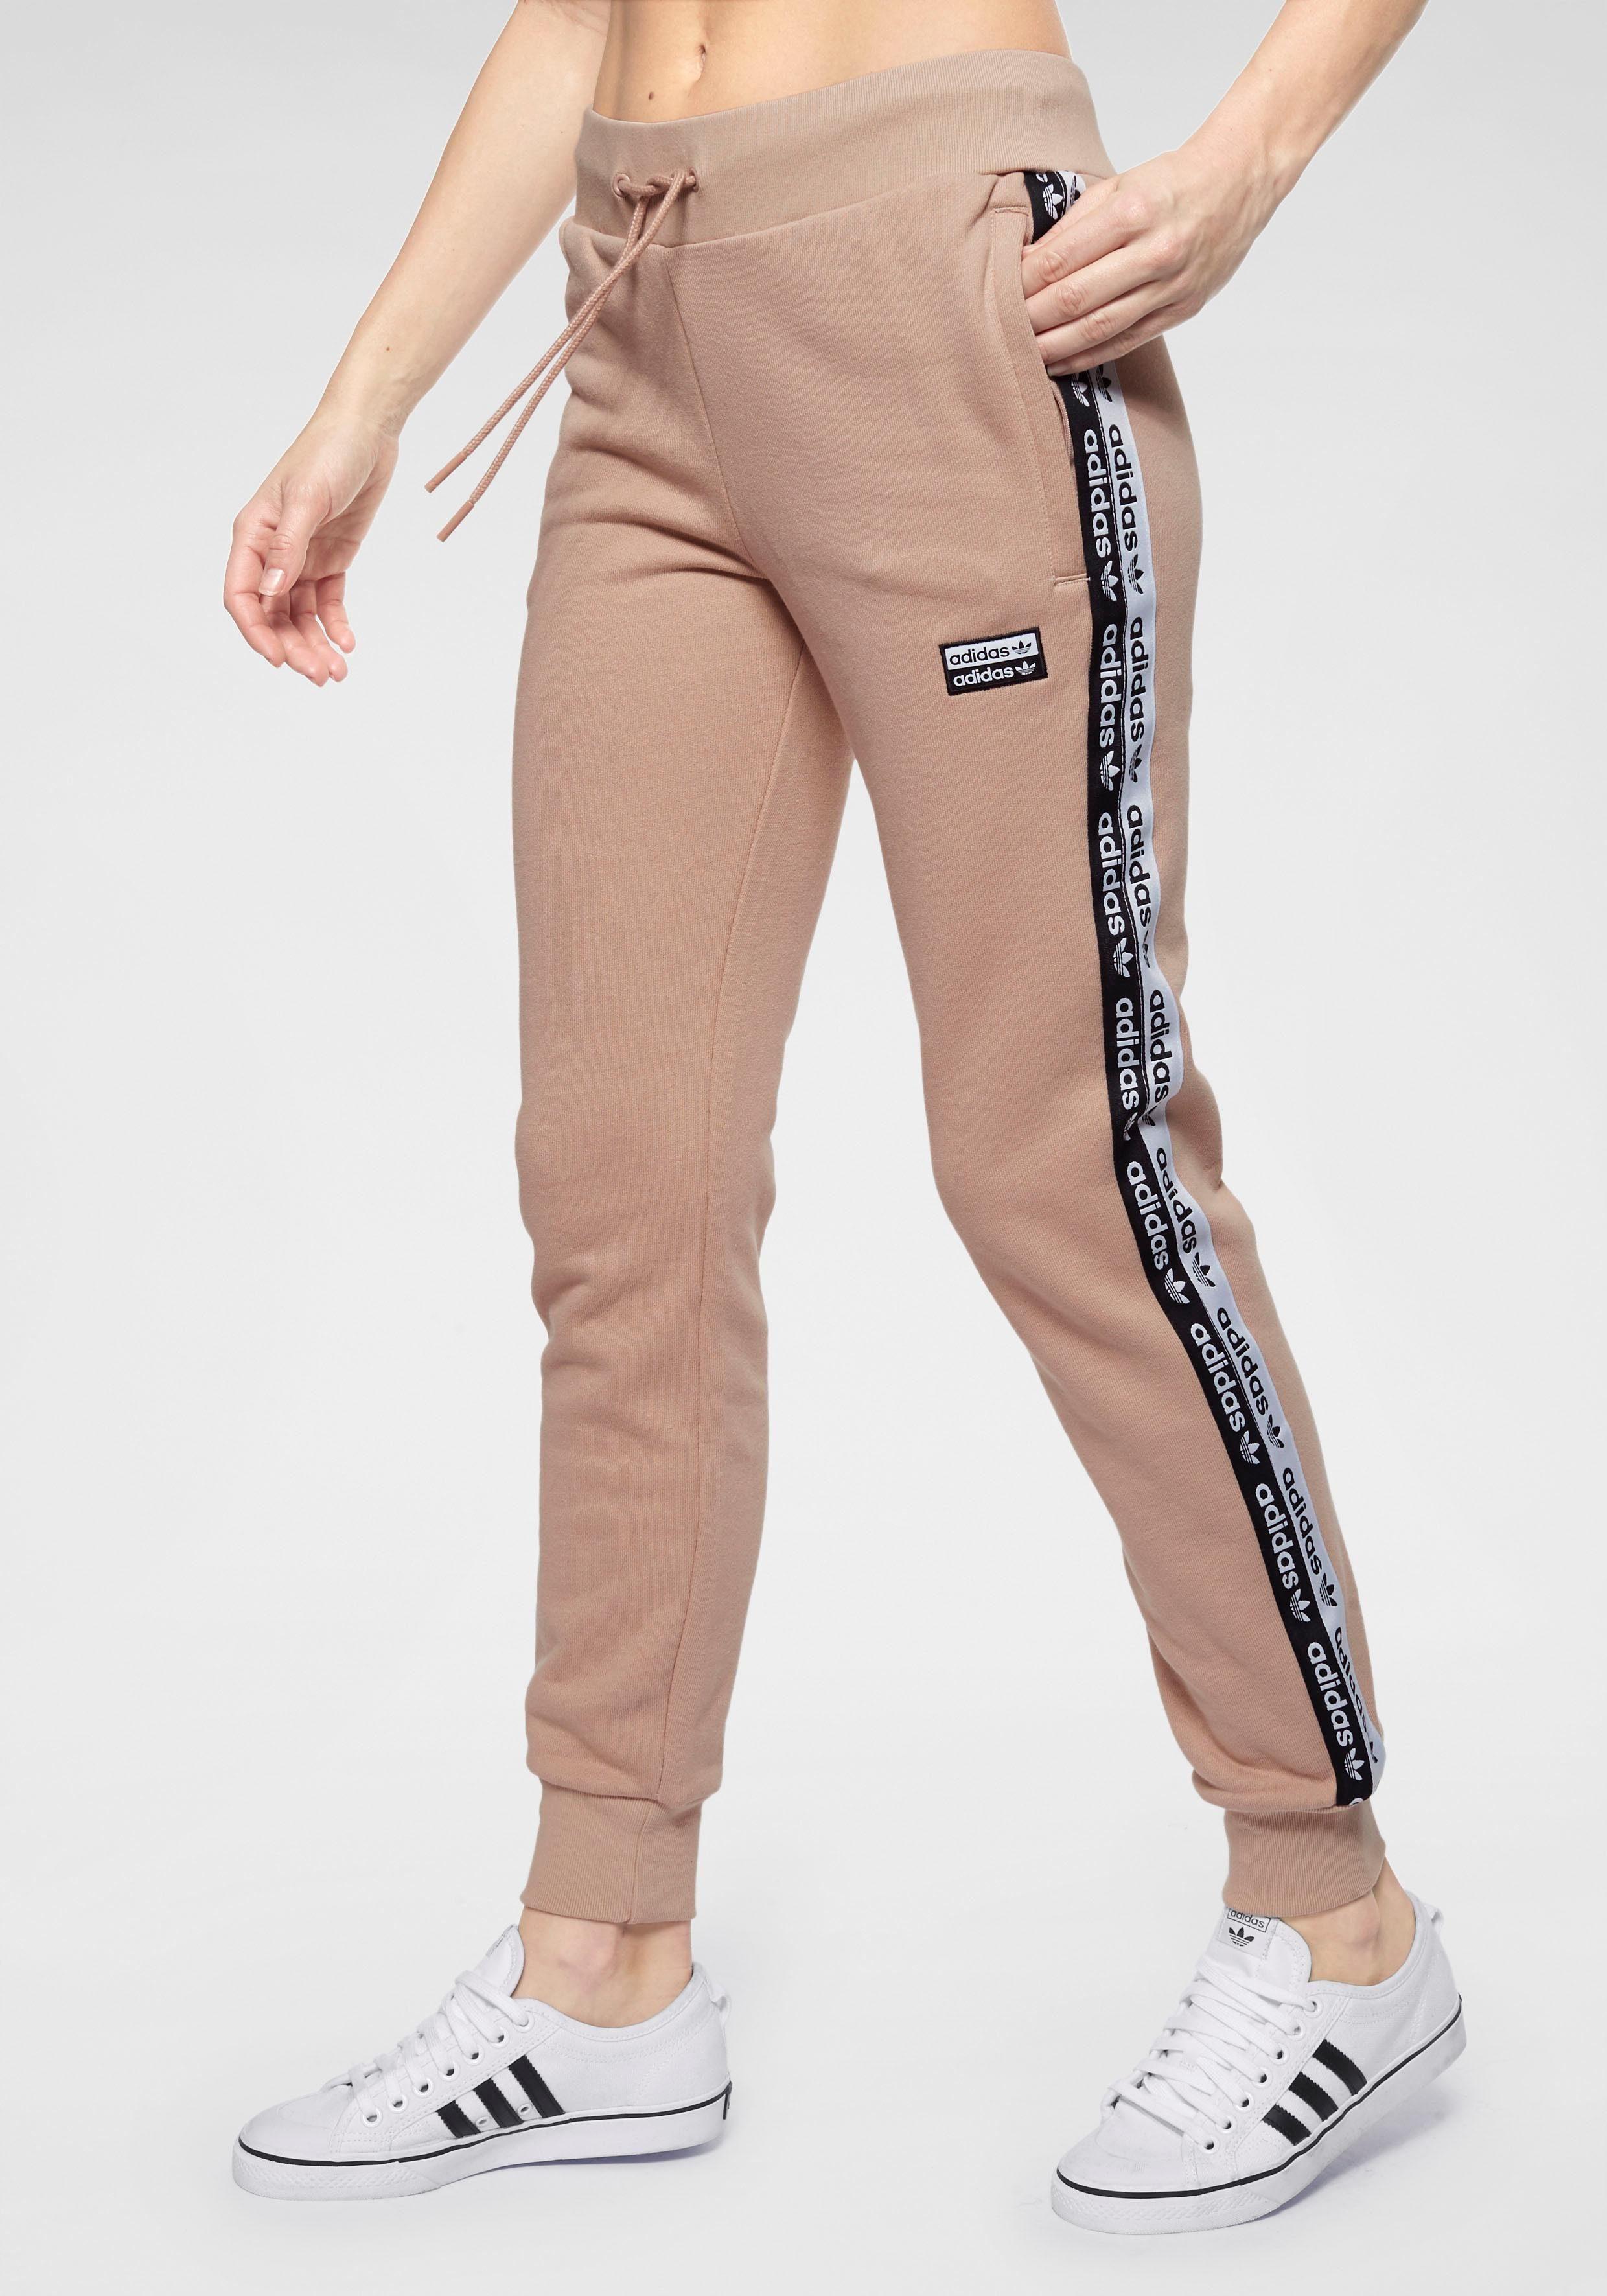 adidas Originals Jogginghose »CUF PANT« kaufen | OTTO